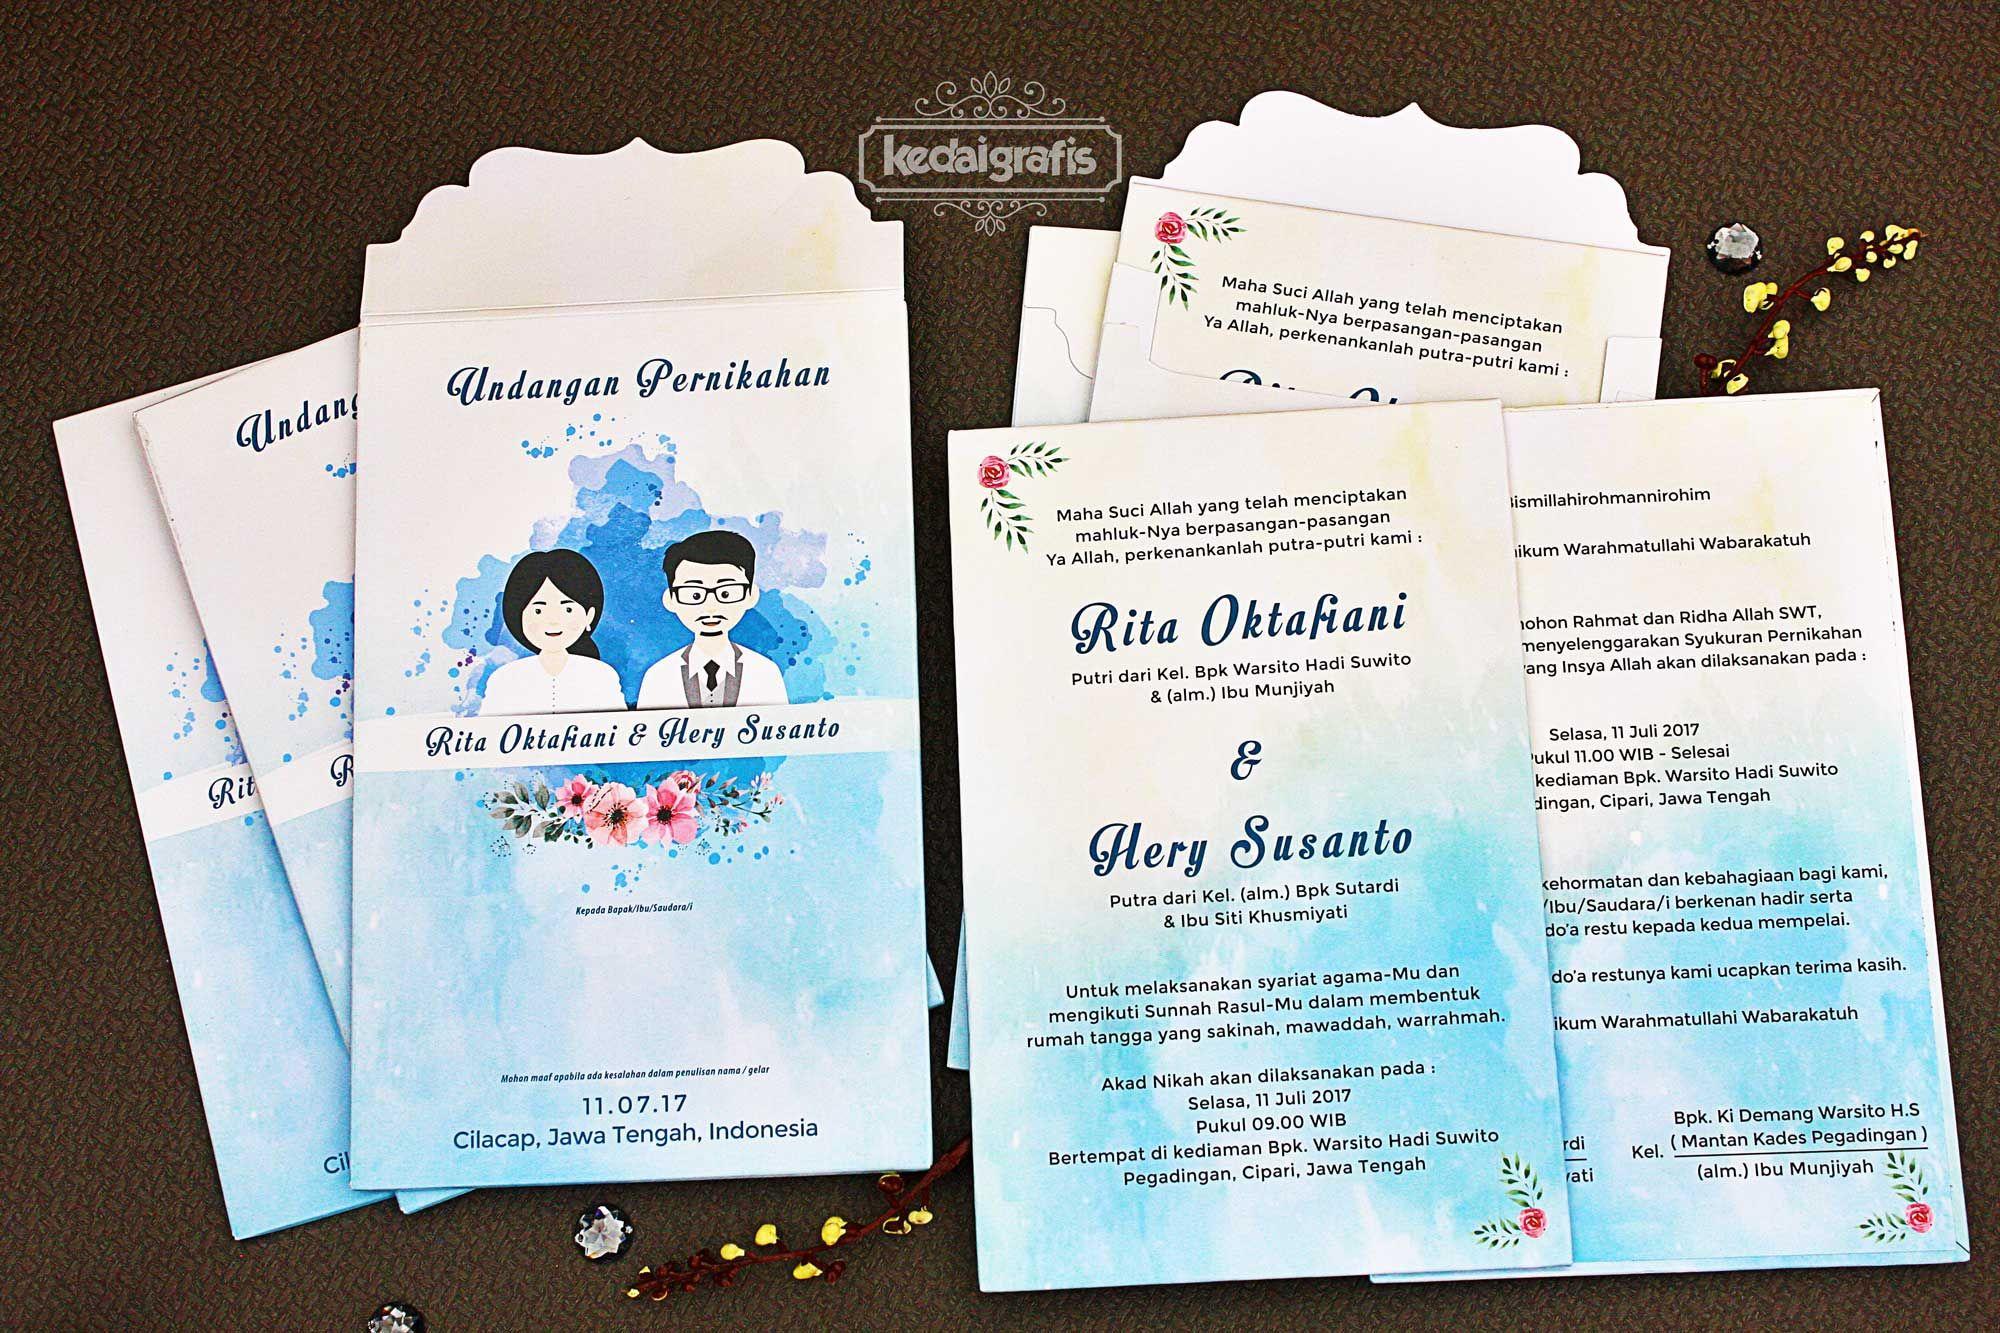 wedding article weddingarticle weddinginvitations